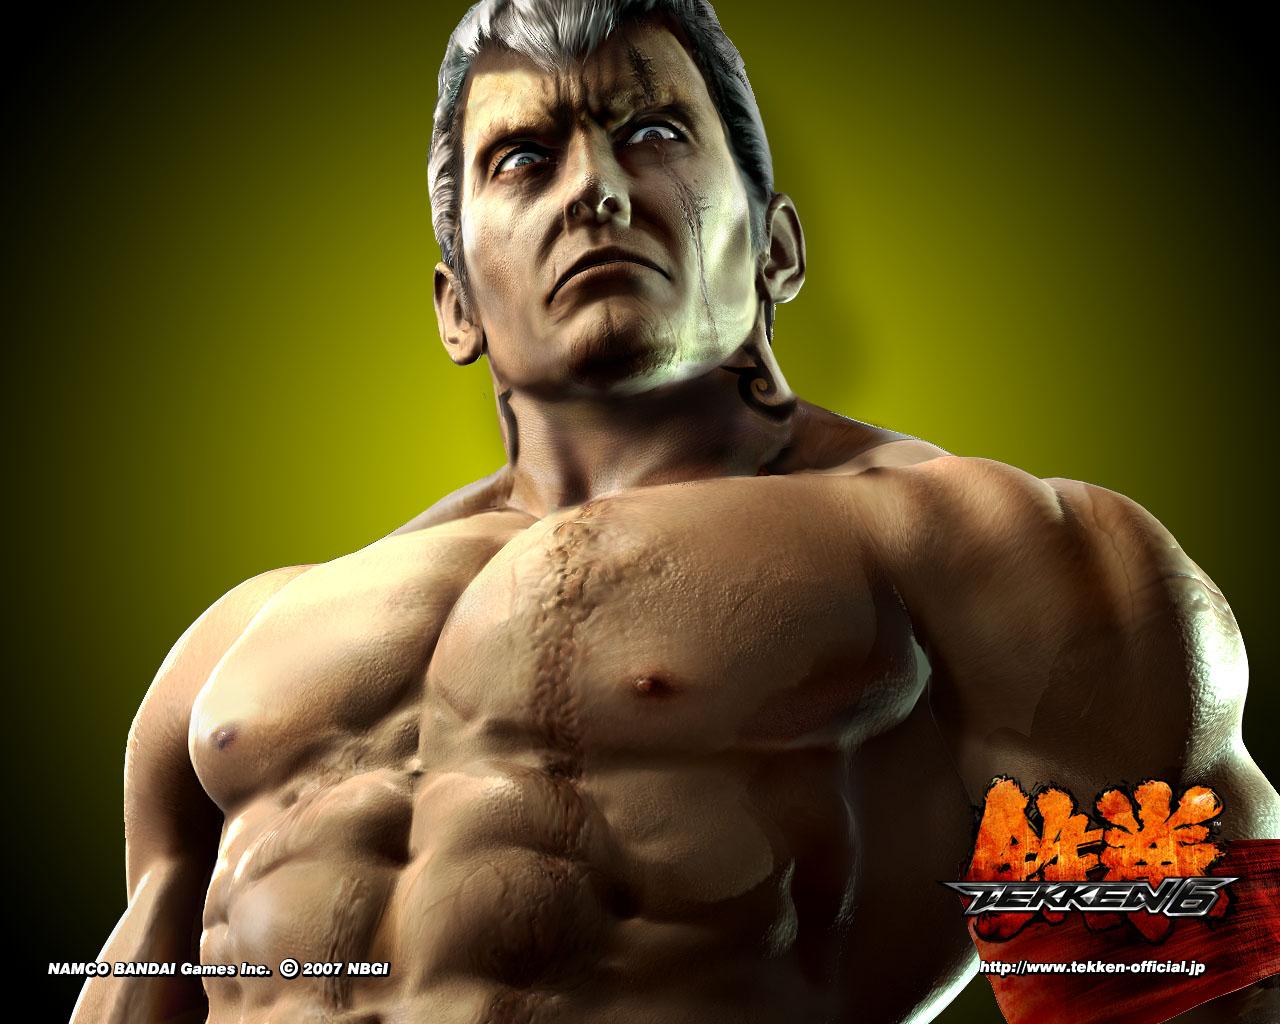 Asus 3d Wallpaper Hd Tekken 6 Hd Wallpapers New Fullypcgames Blogspot Com